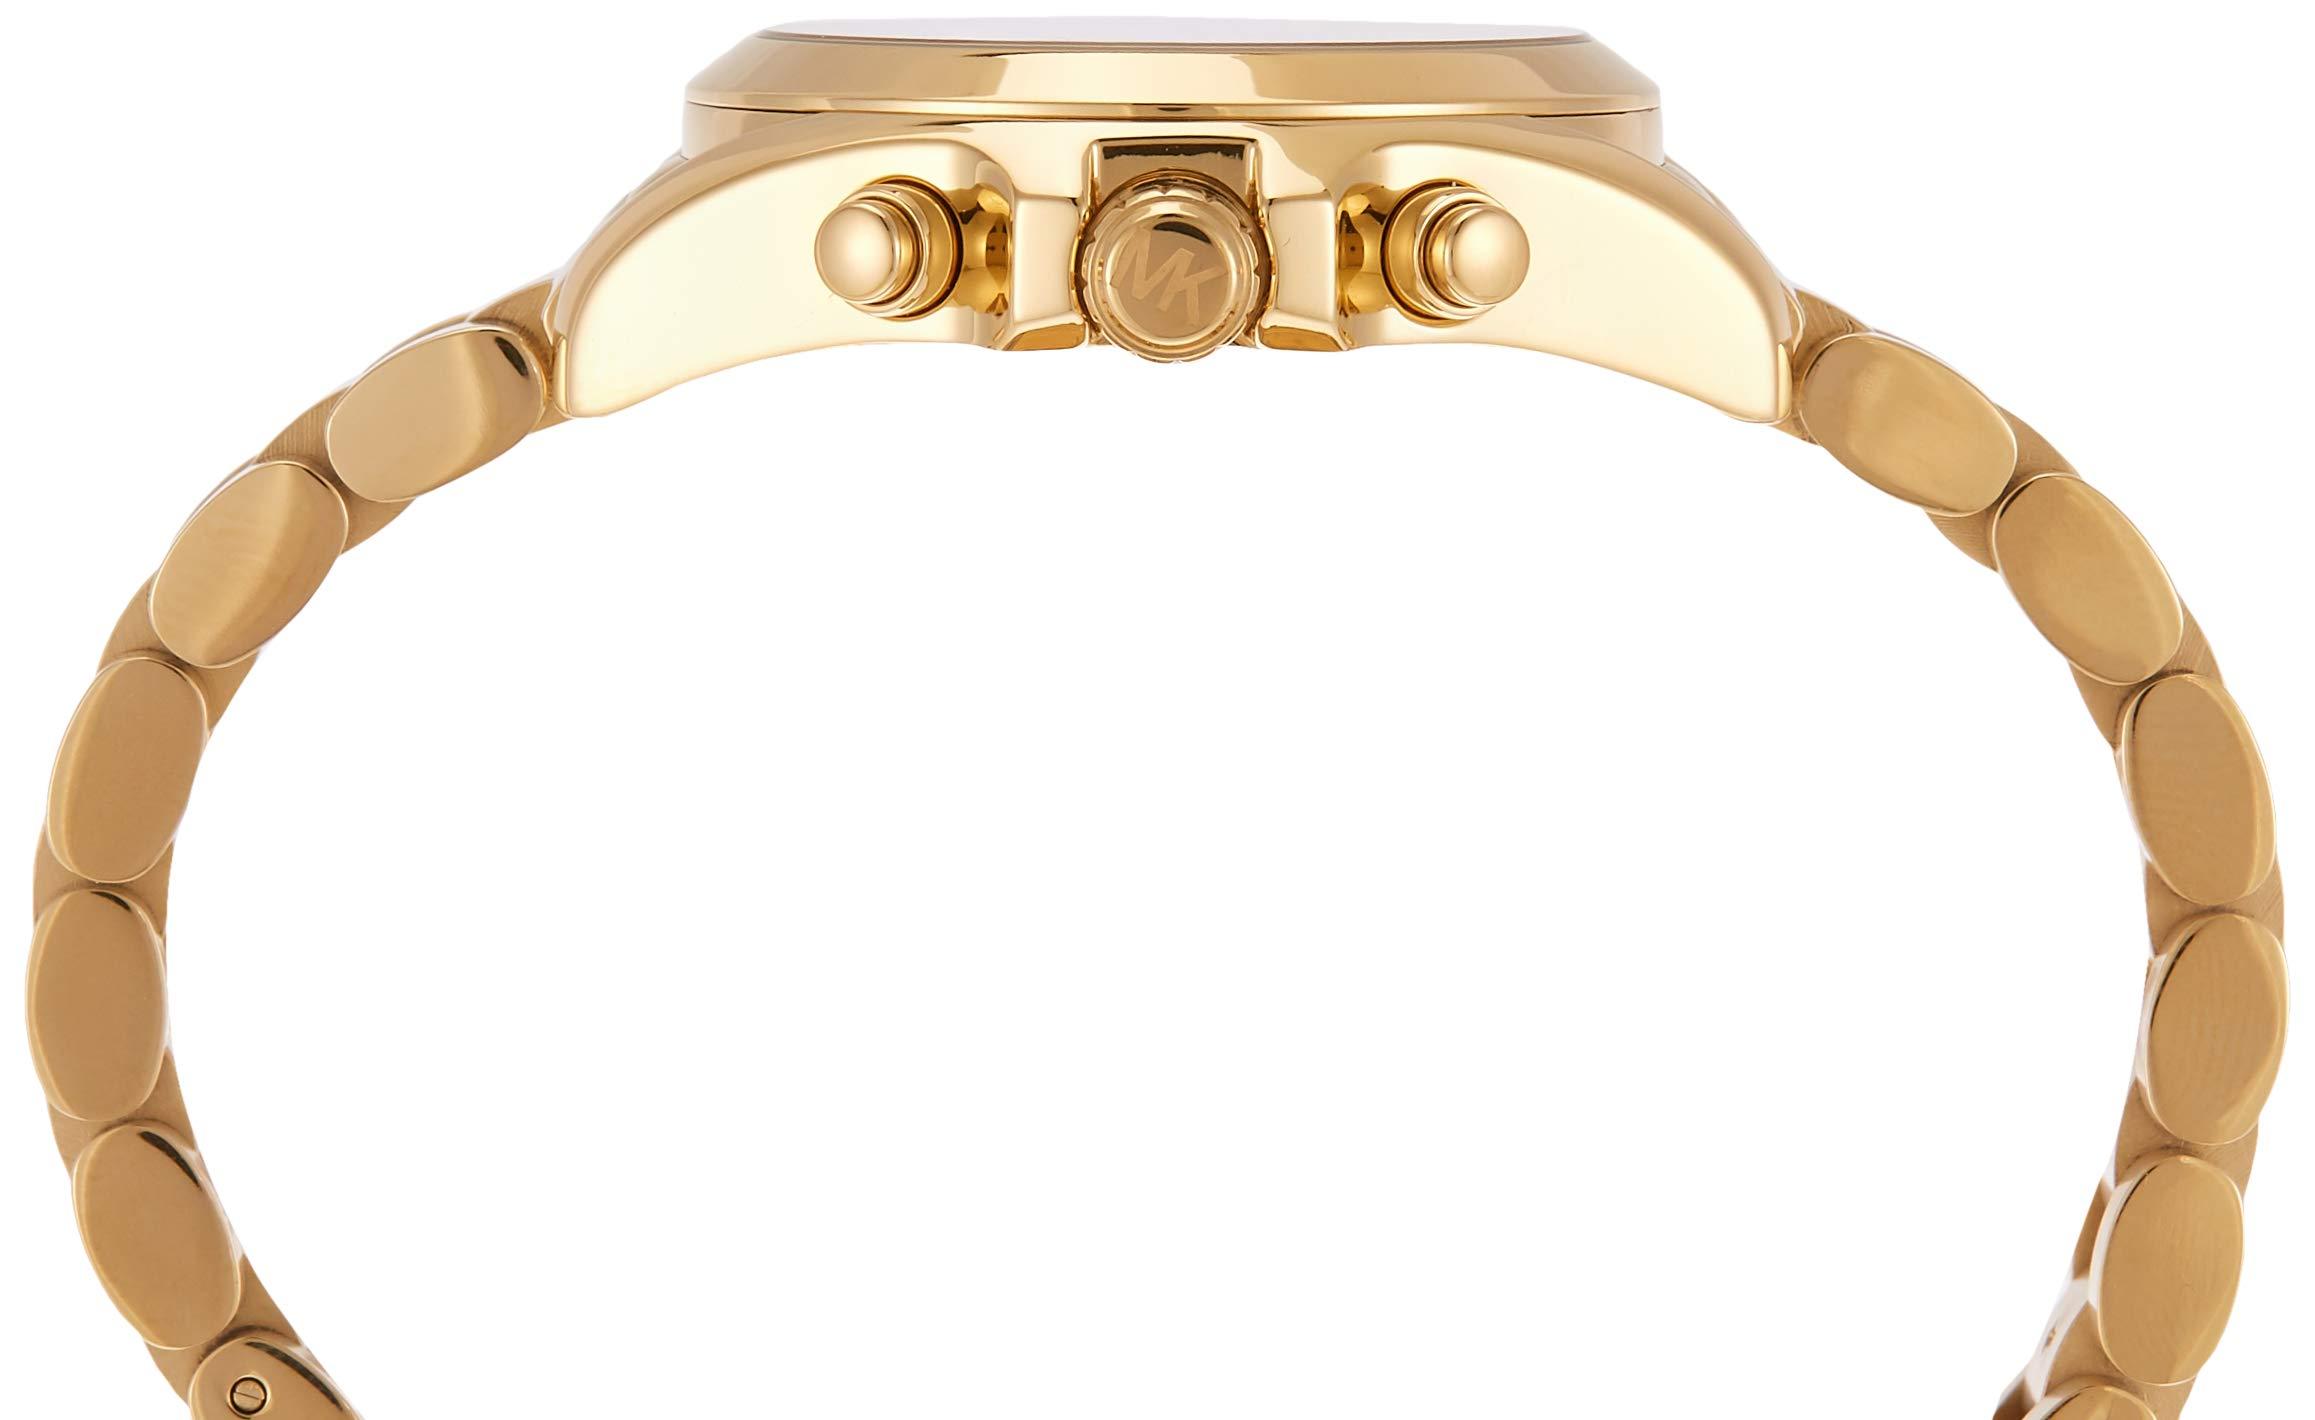 Michael-Kors-Bradshaw-Womens-Chronograph-Wrist-Watch-36MM